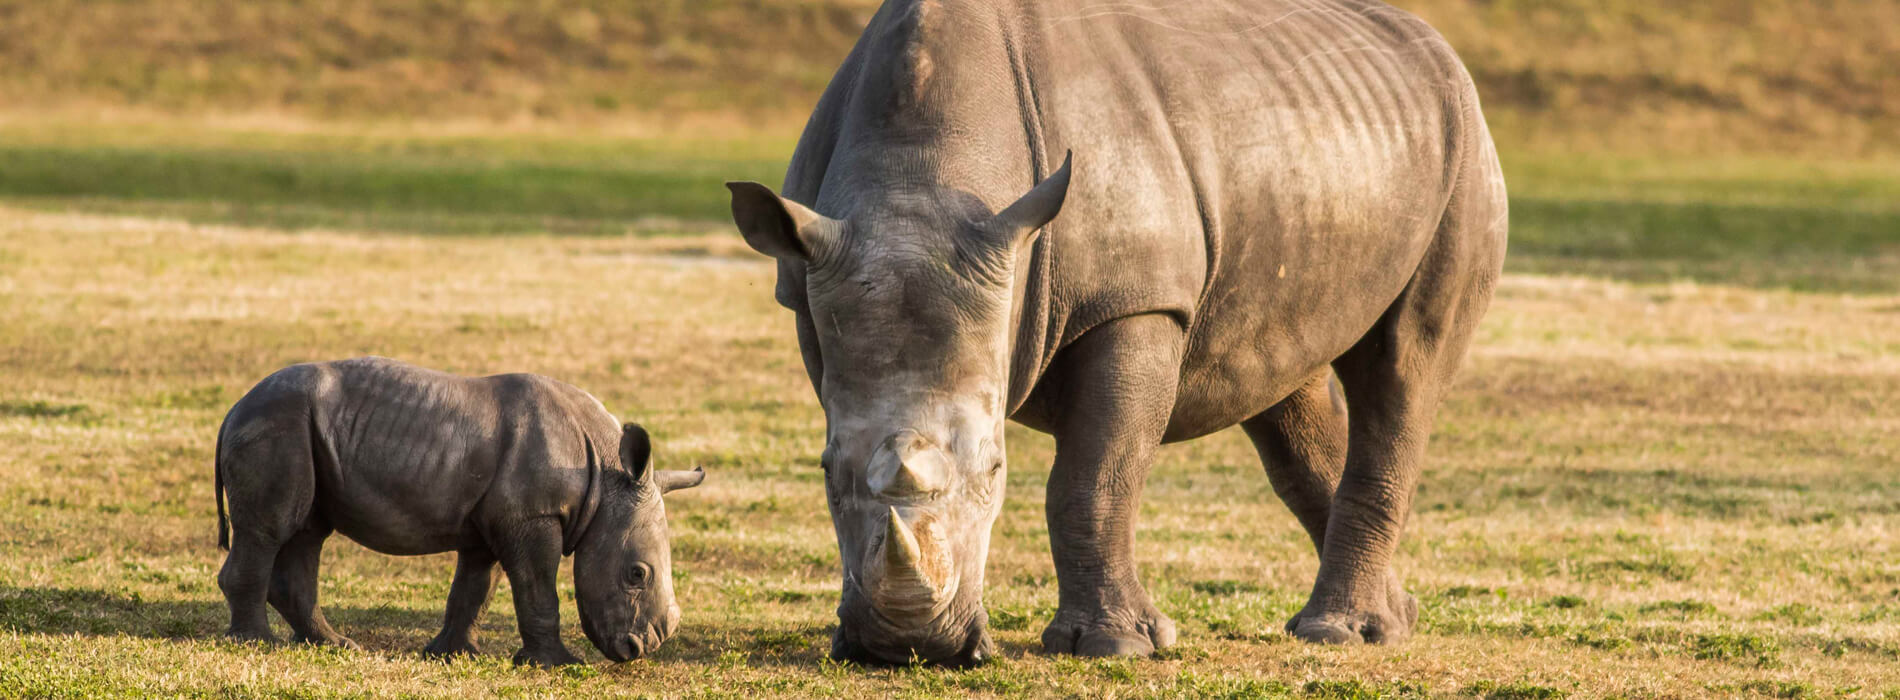 Rhinos at Busch Gardens Tampa Bay